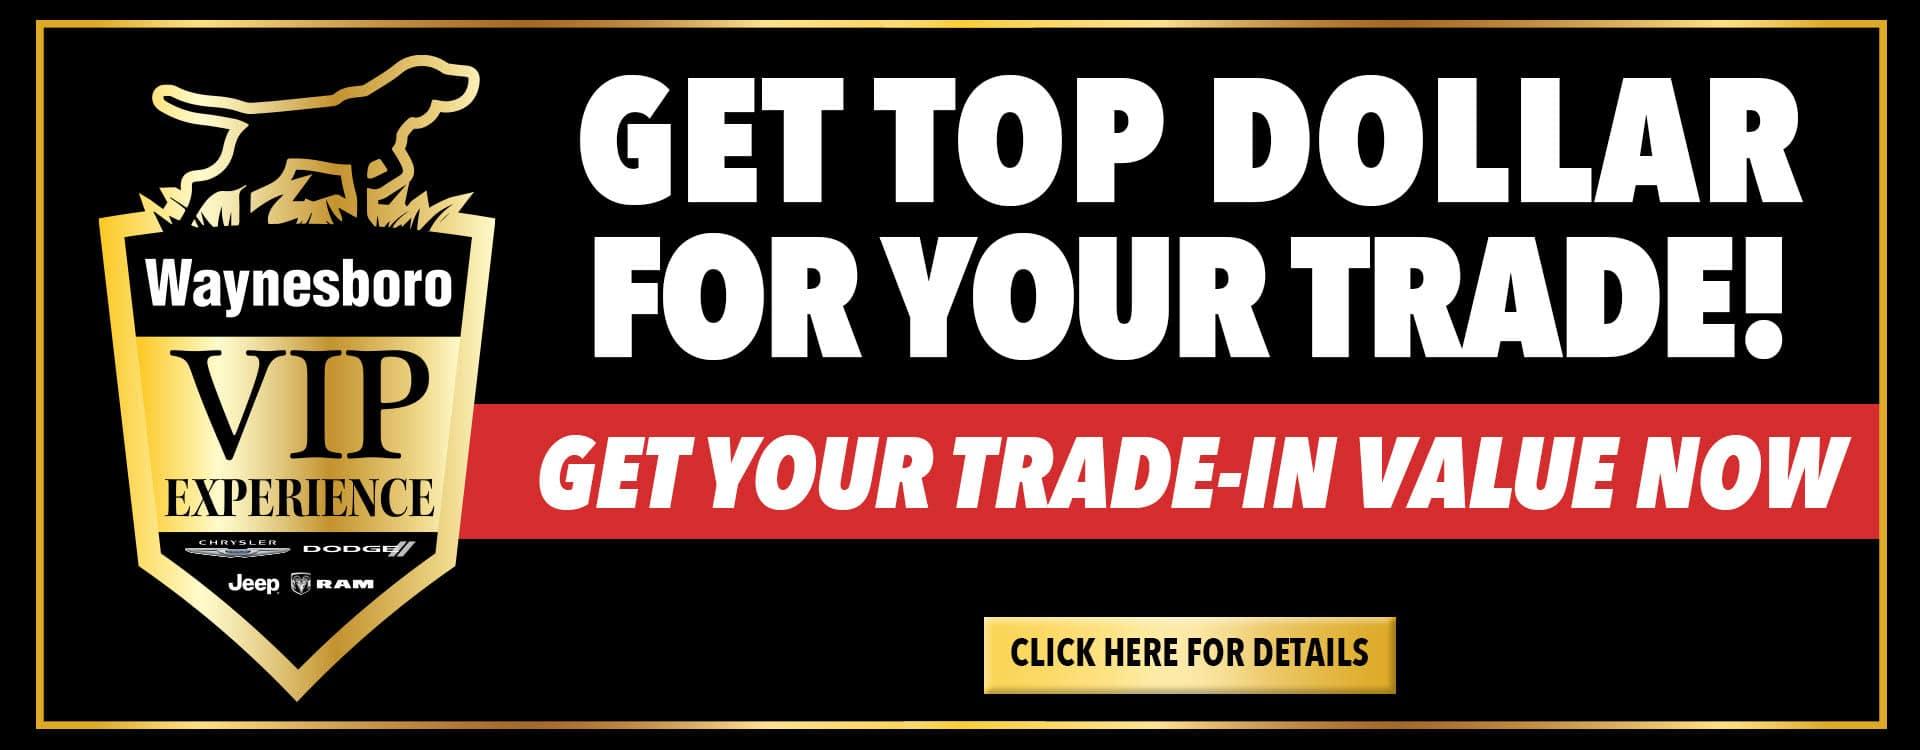 Waynesboro CDJR Trade Banner May 2021